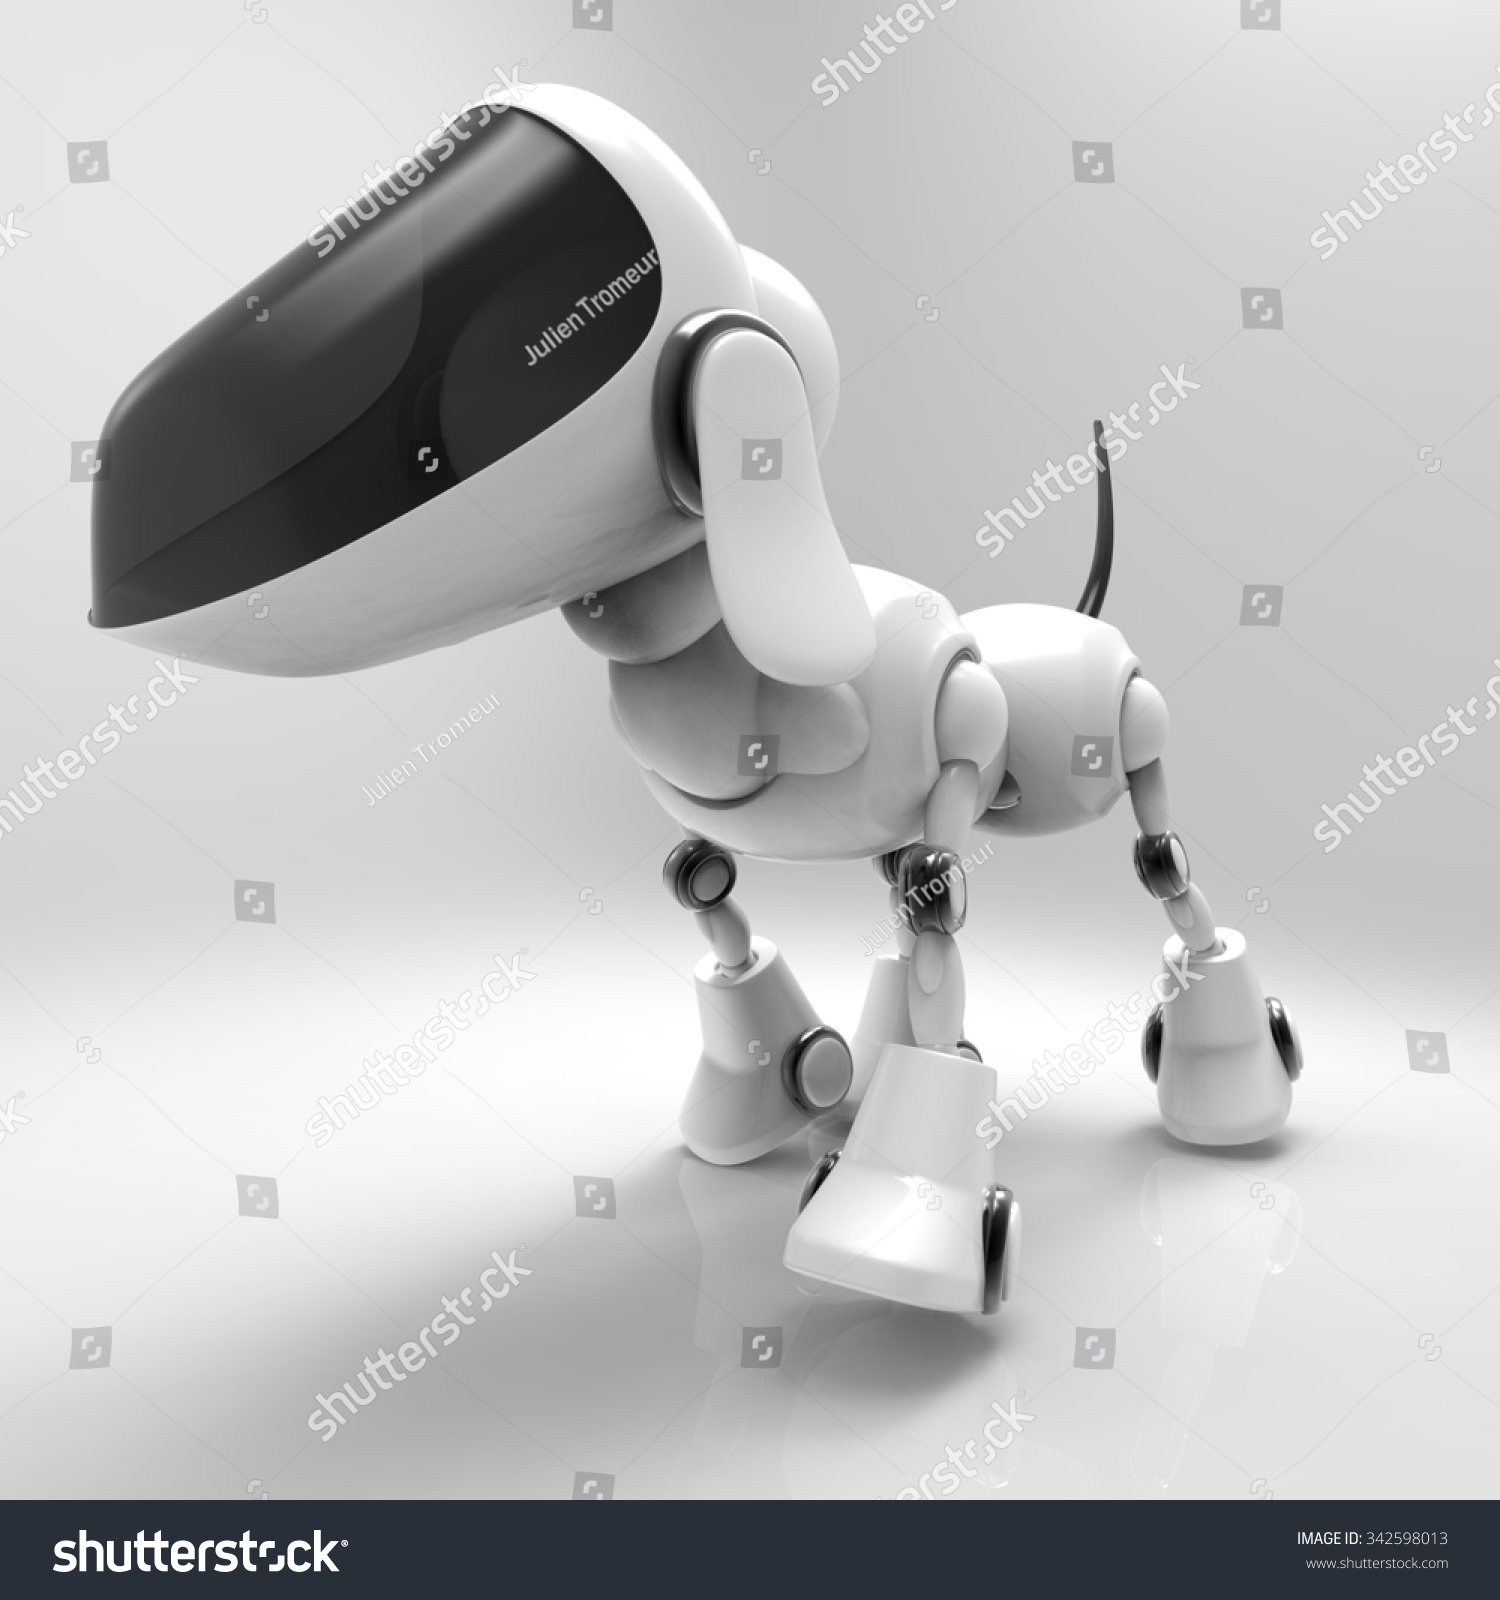 creating a robot pet dog essay